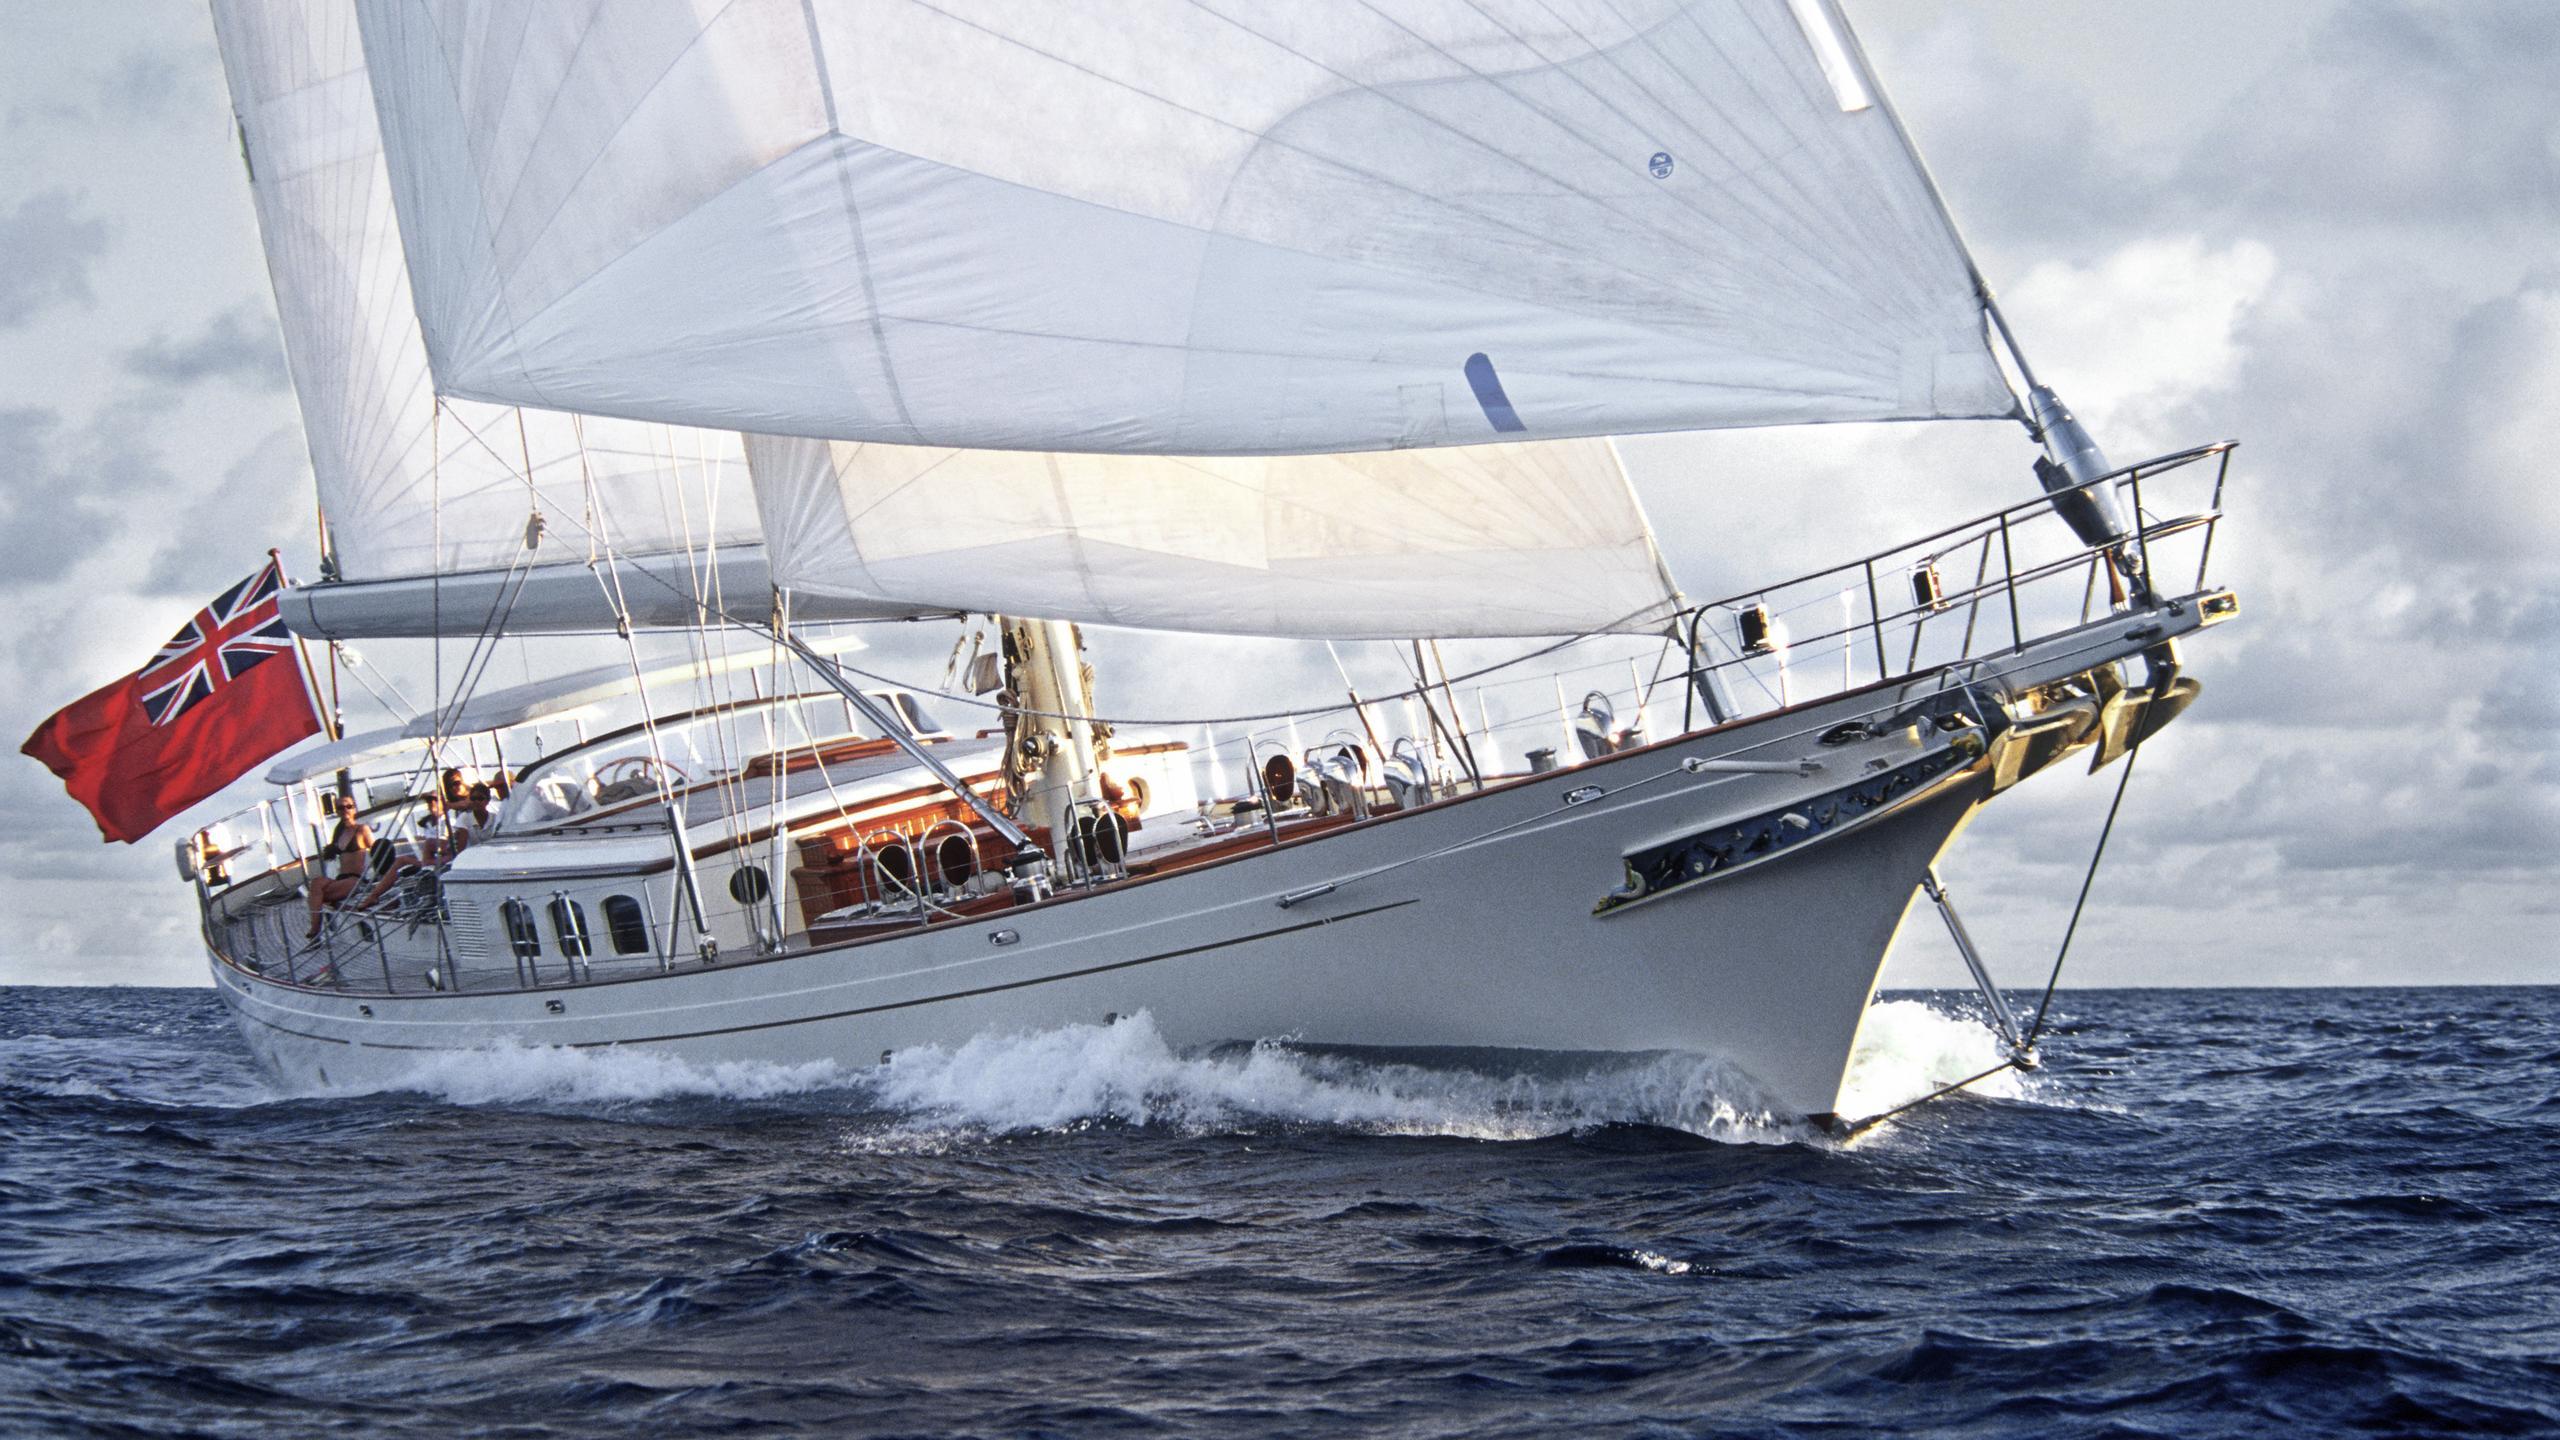 foftein-ii-yacht-for-sale-profile